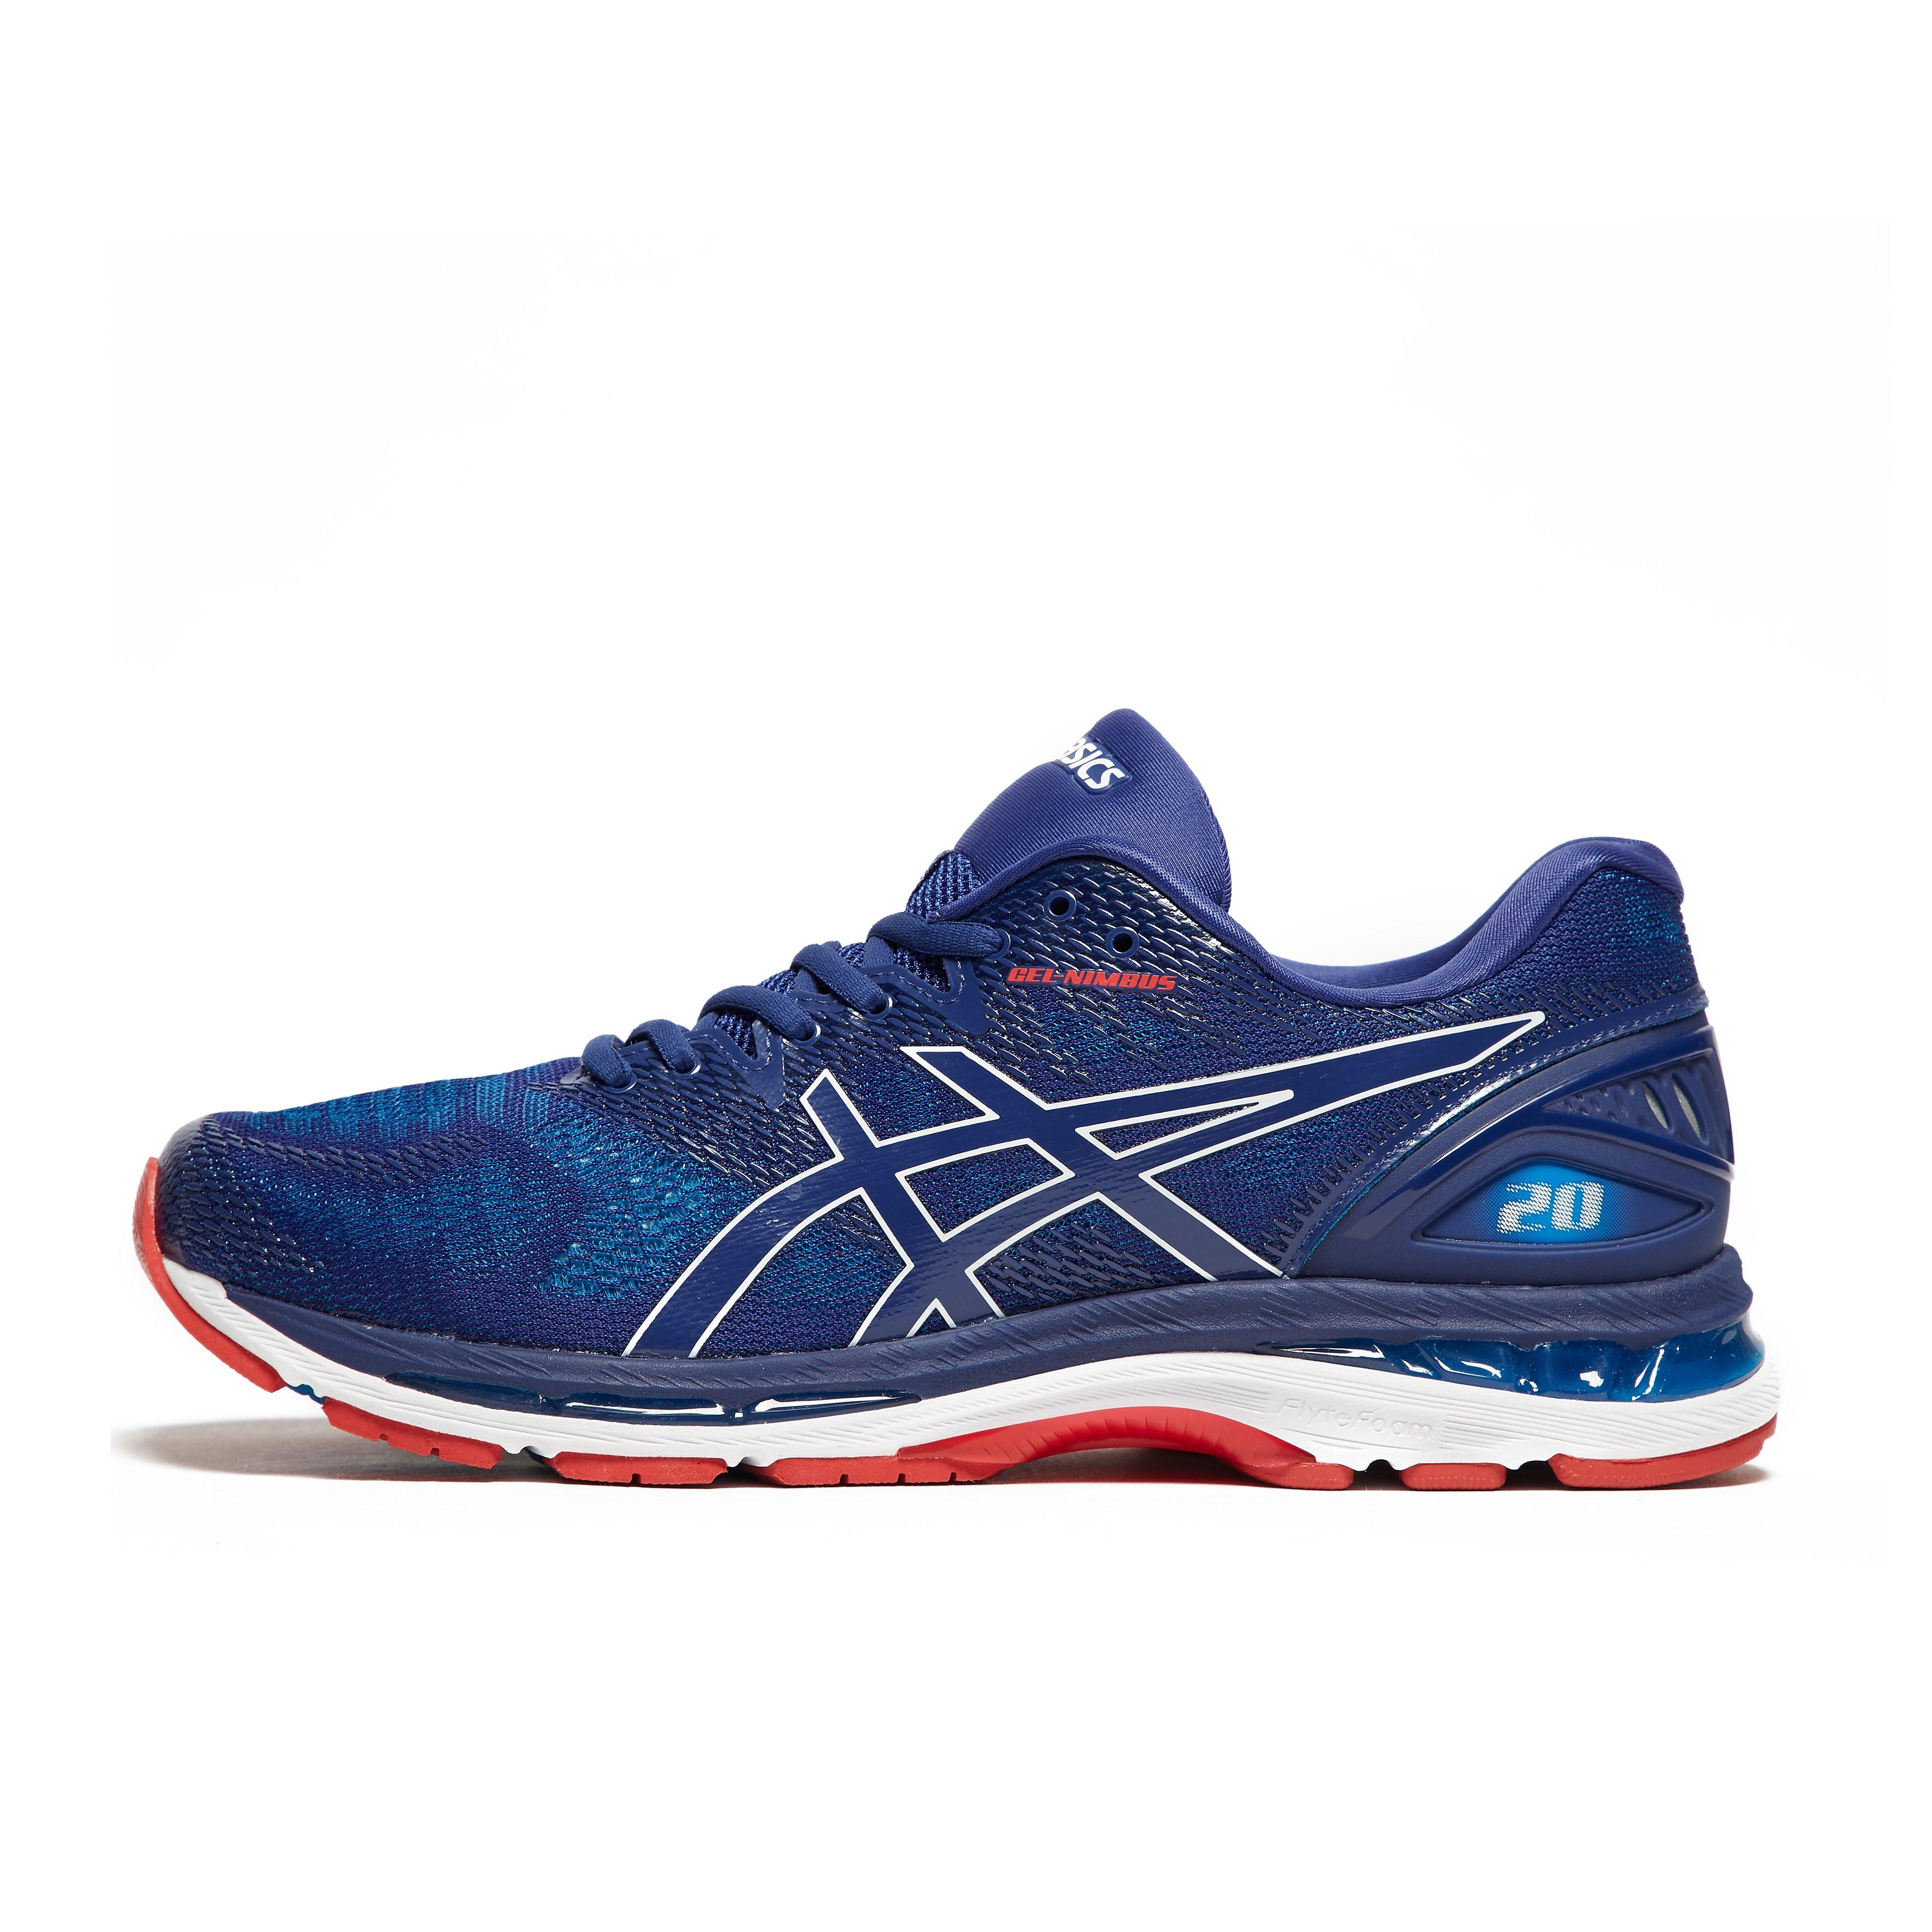 Mens Blue ASICS Gel-Nimbus 20 Running Shoes